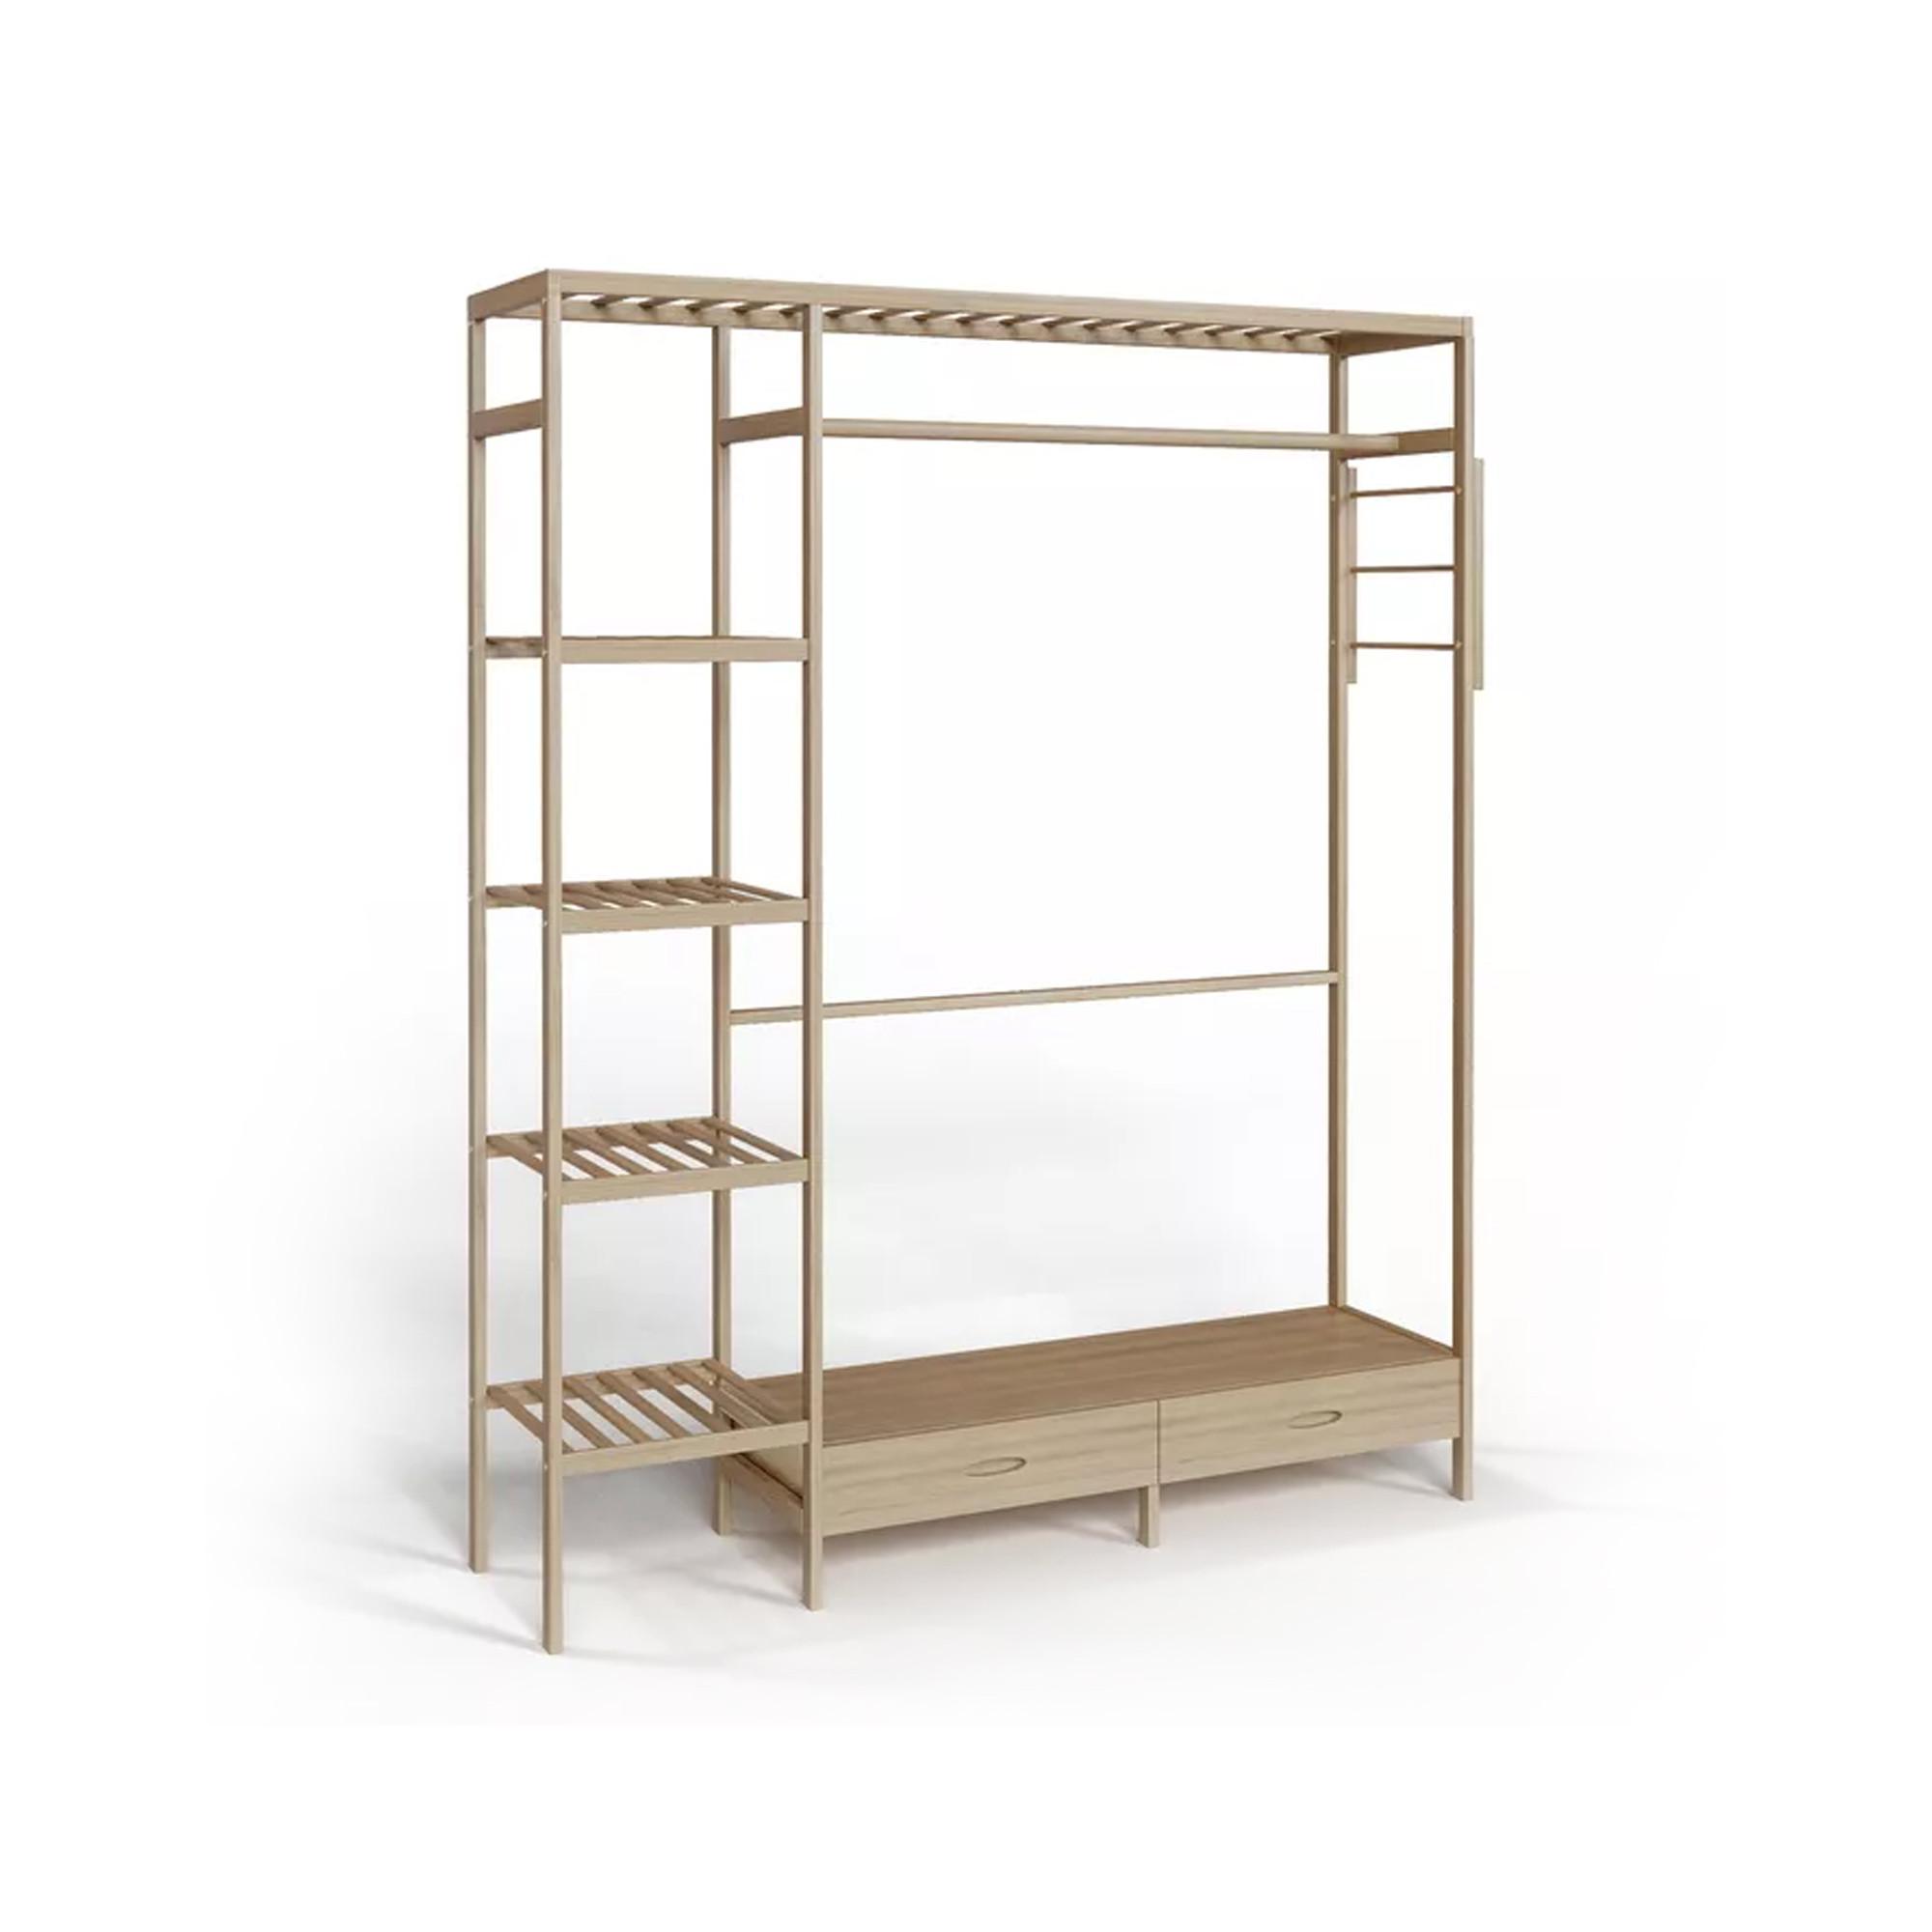 Шкаф-витрина Гардероб из дуба, 36х36х78,4 см